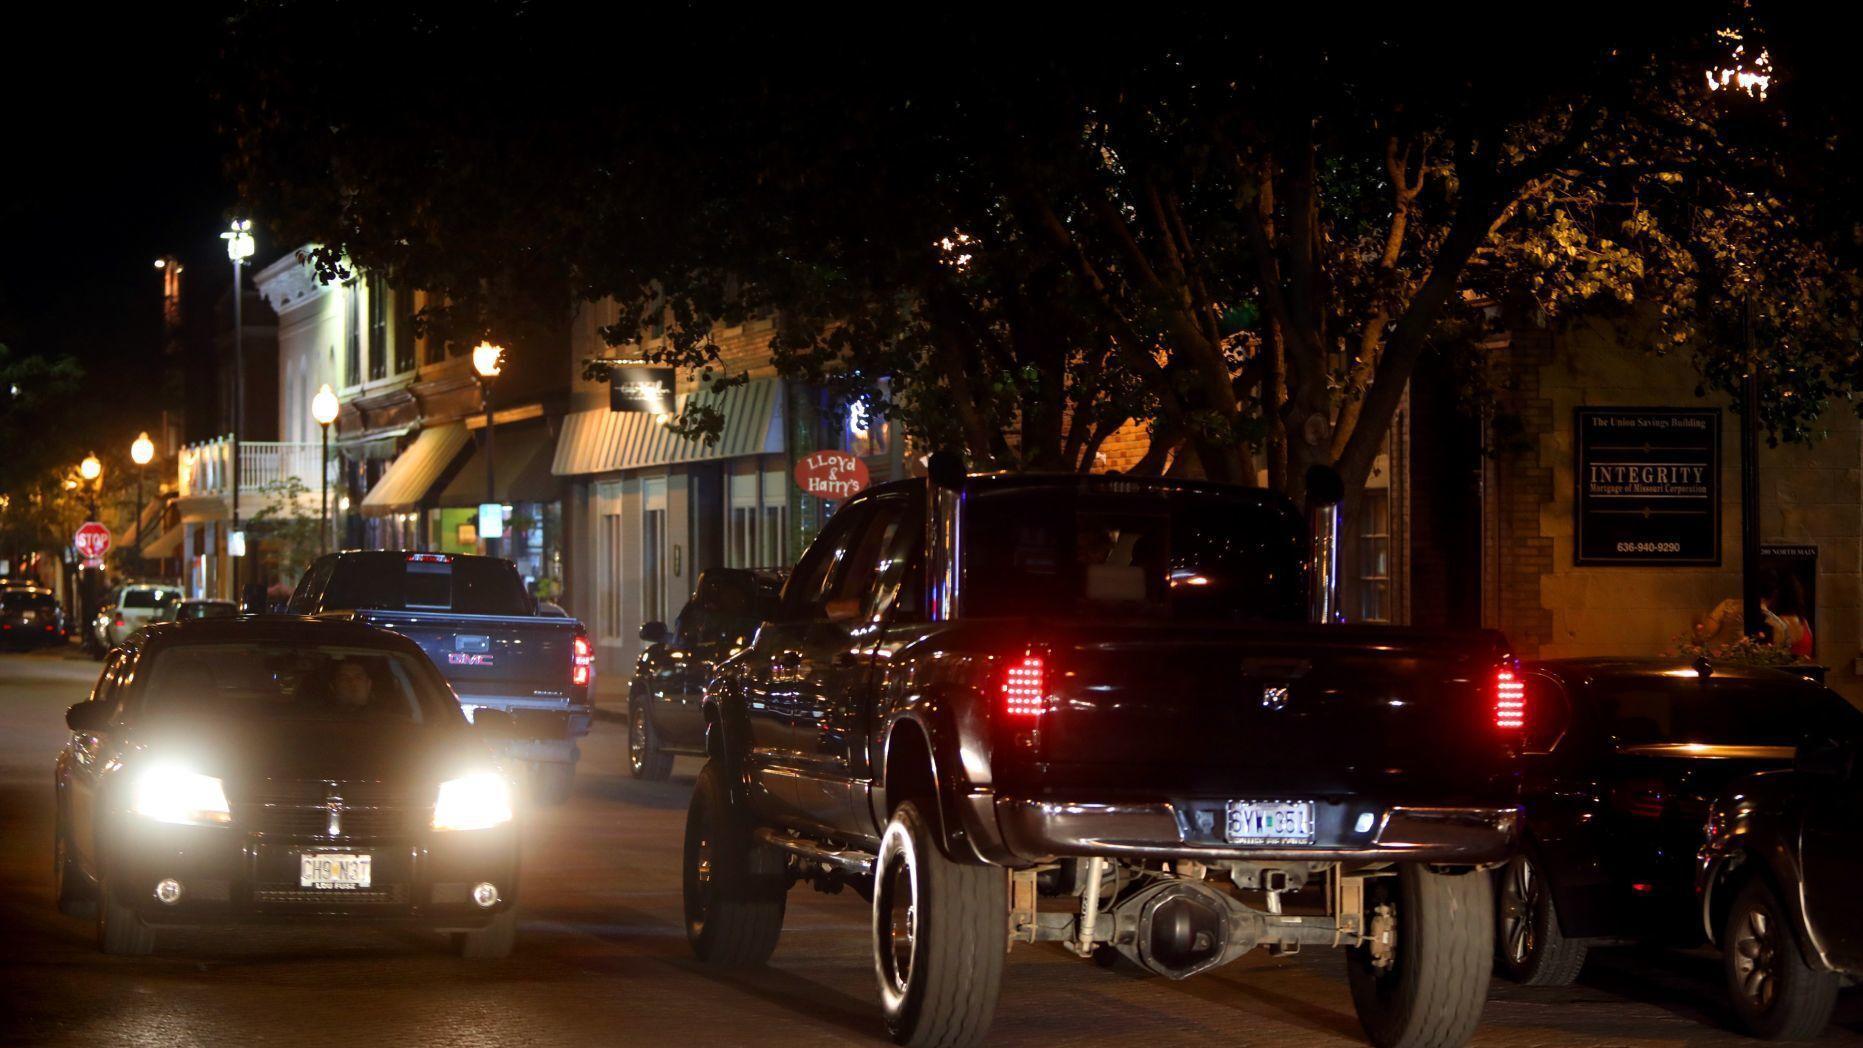 'Mayor Footloose' bans dancing, loud music on some blocks of downtown St. Charles